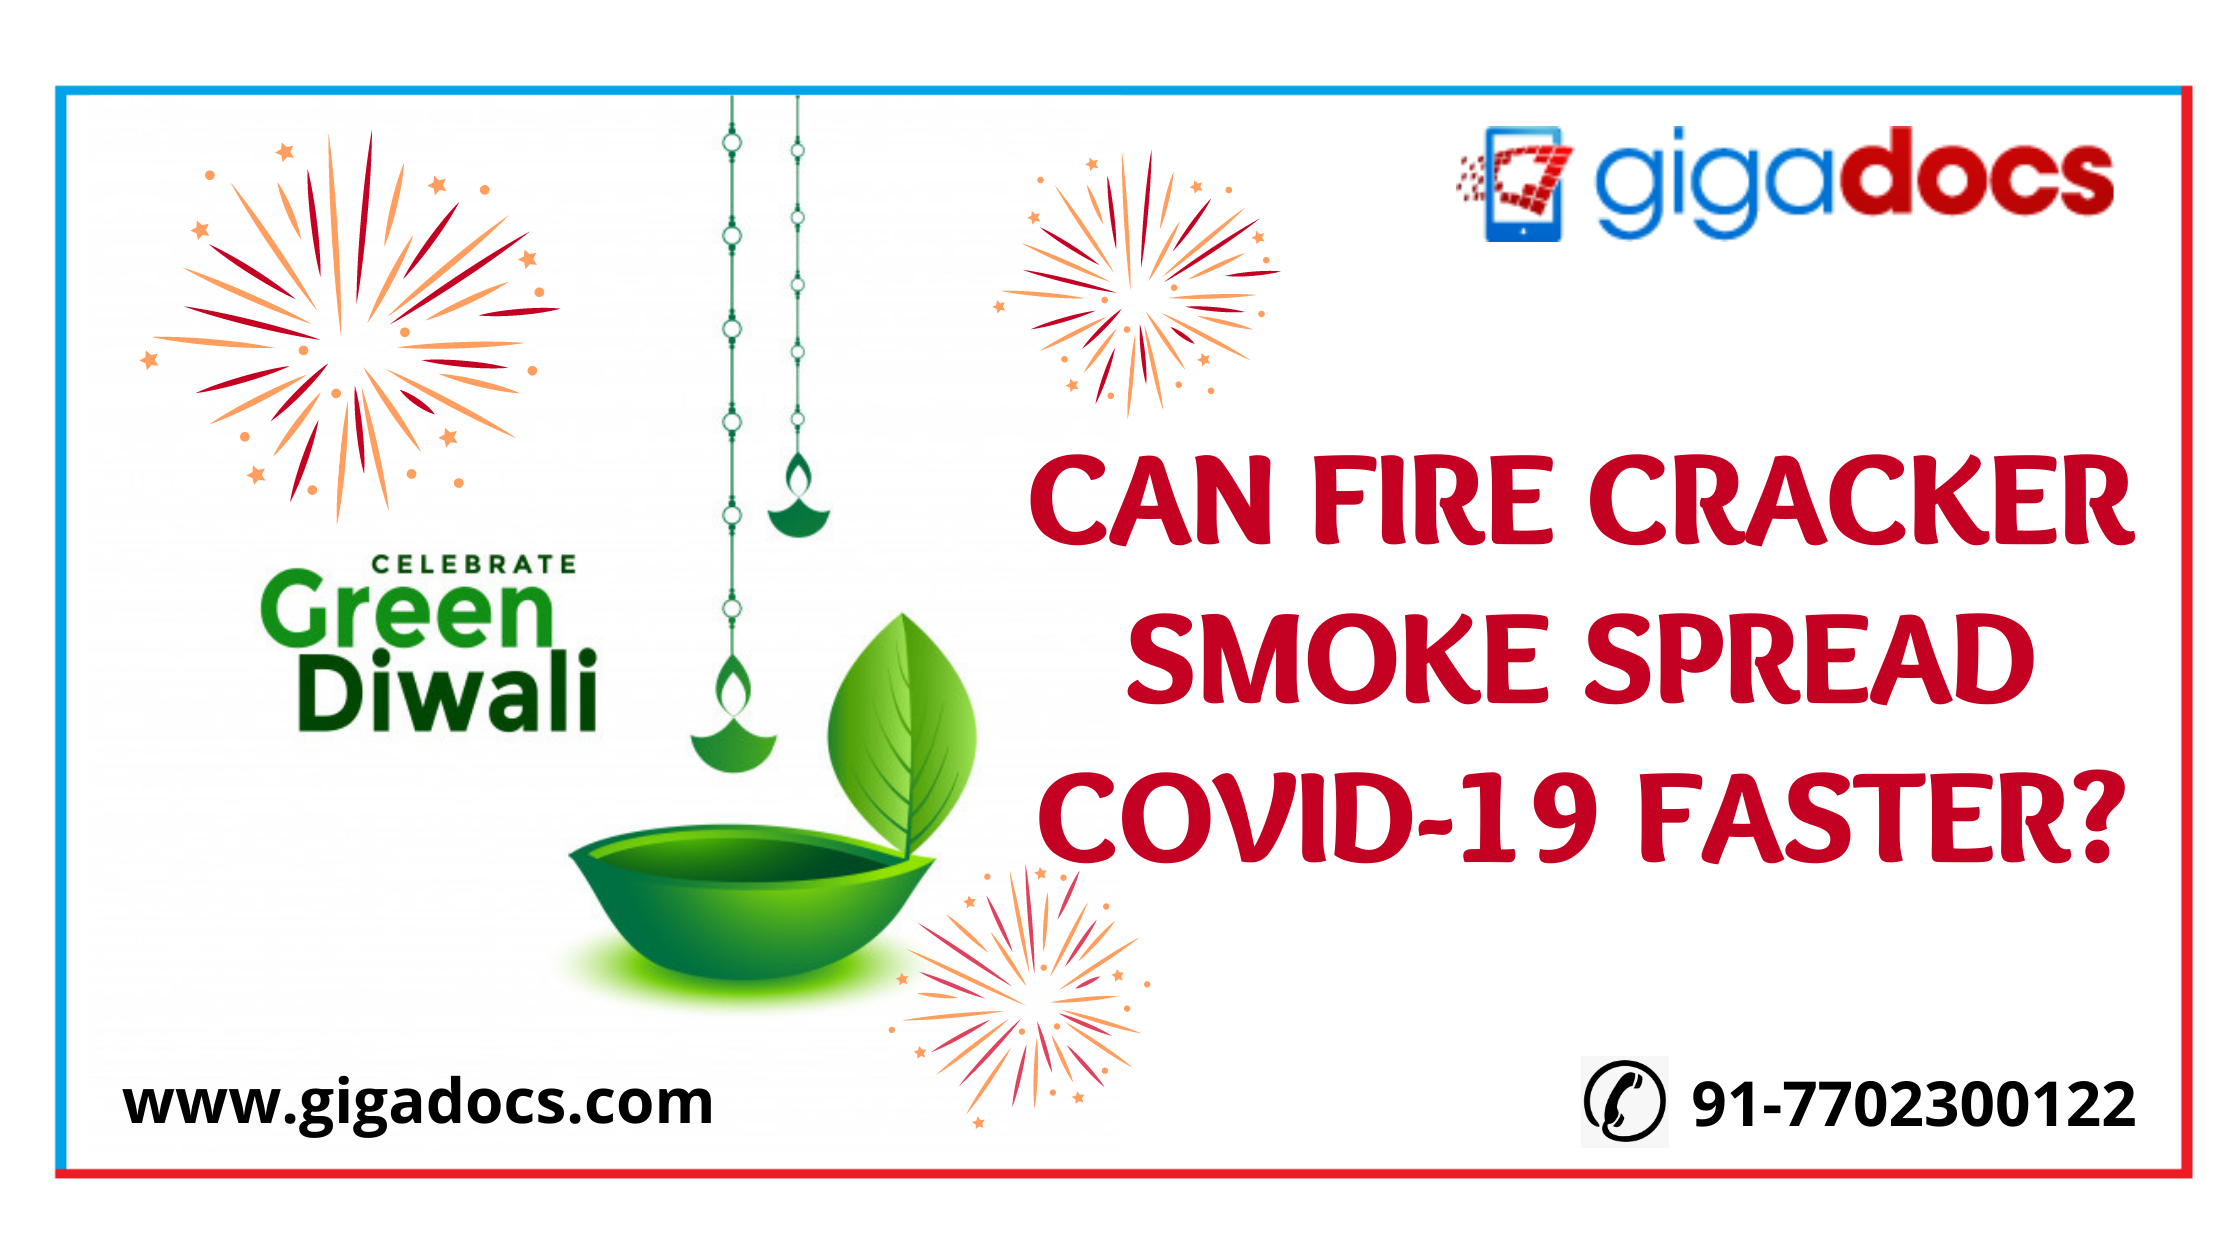 Green Diwali: Can Fire Cracker Smoke Spread Covid-19 Faster?